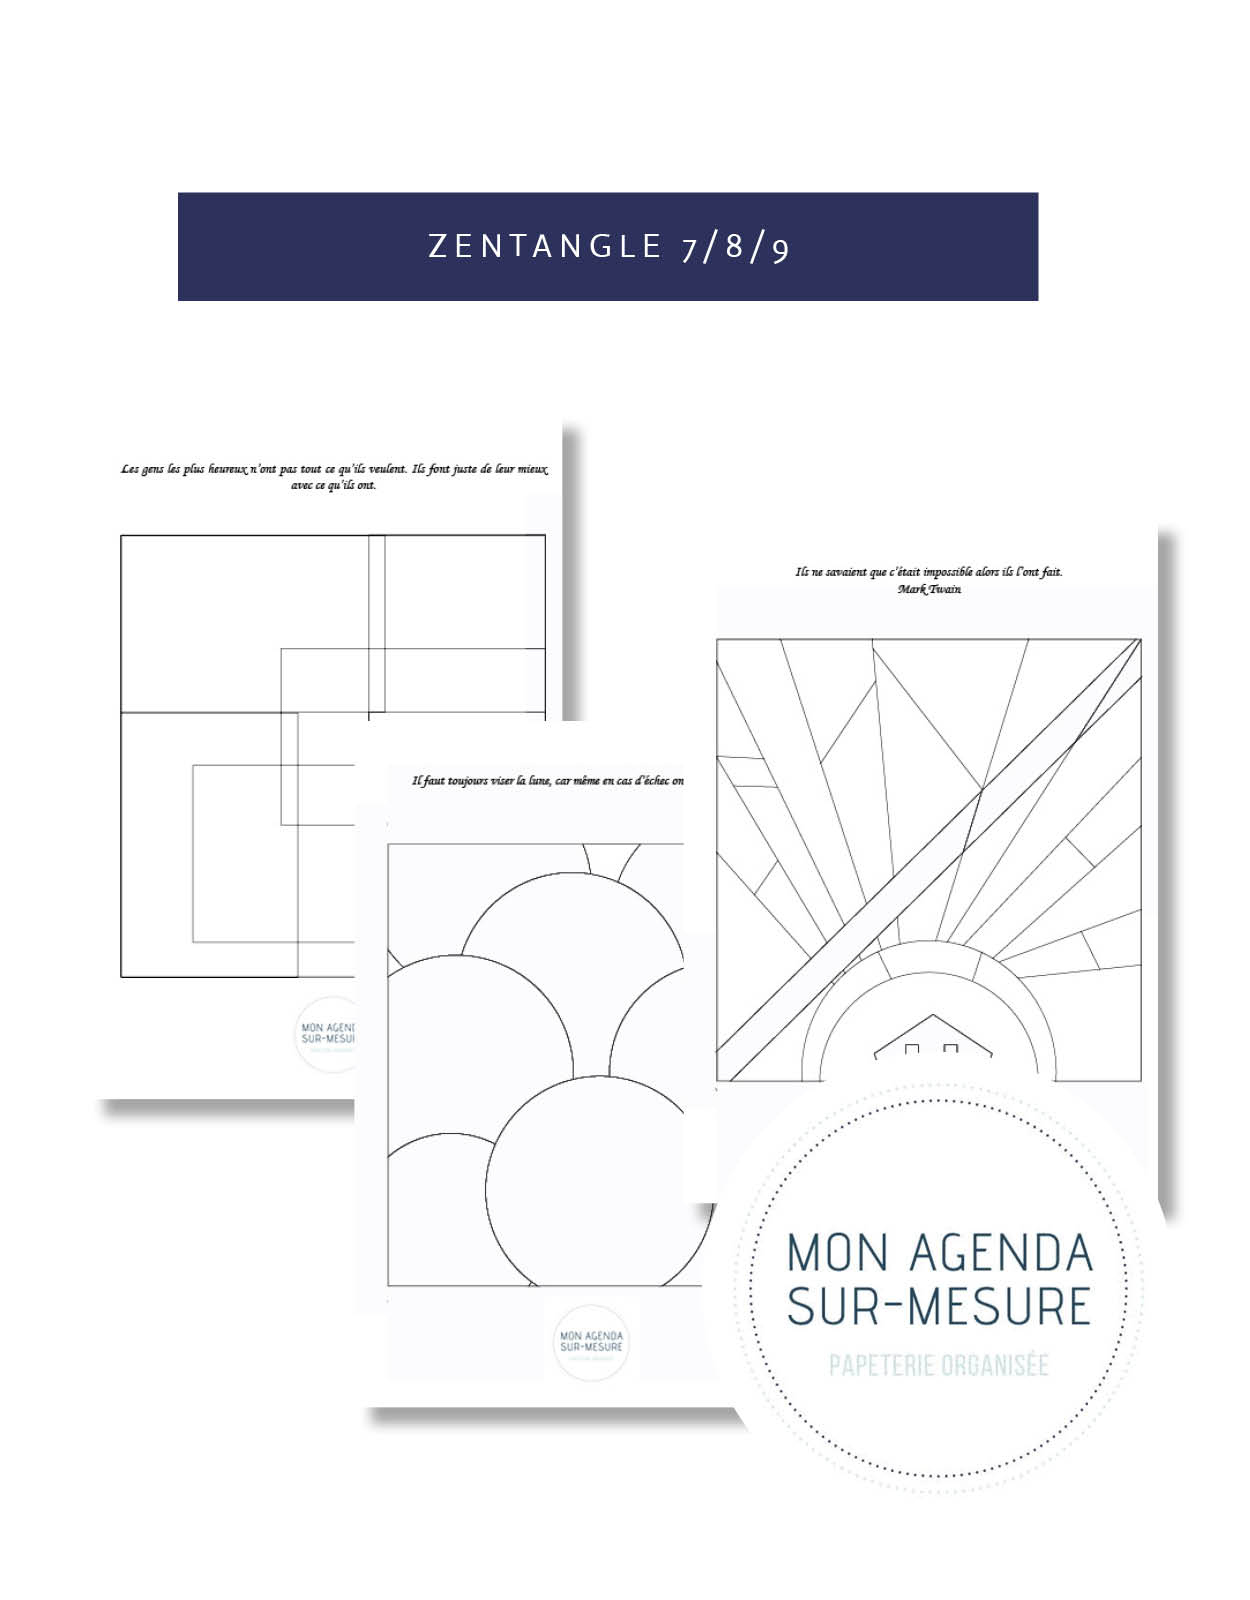 page-agenda-sur-mesure-zentangle-originaux